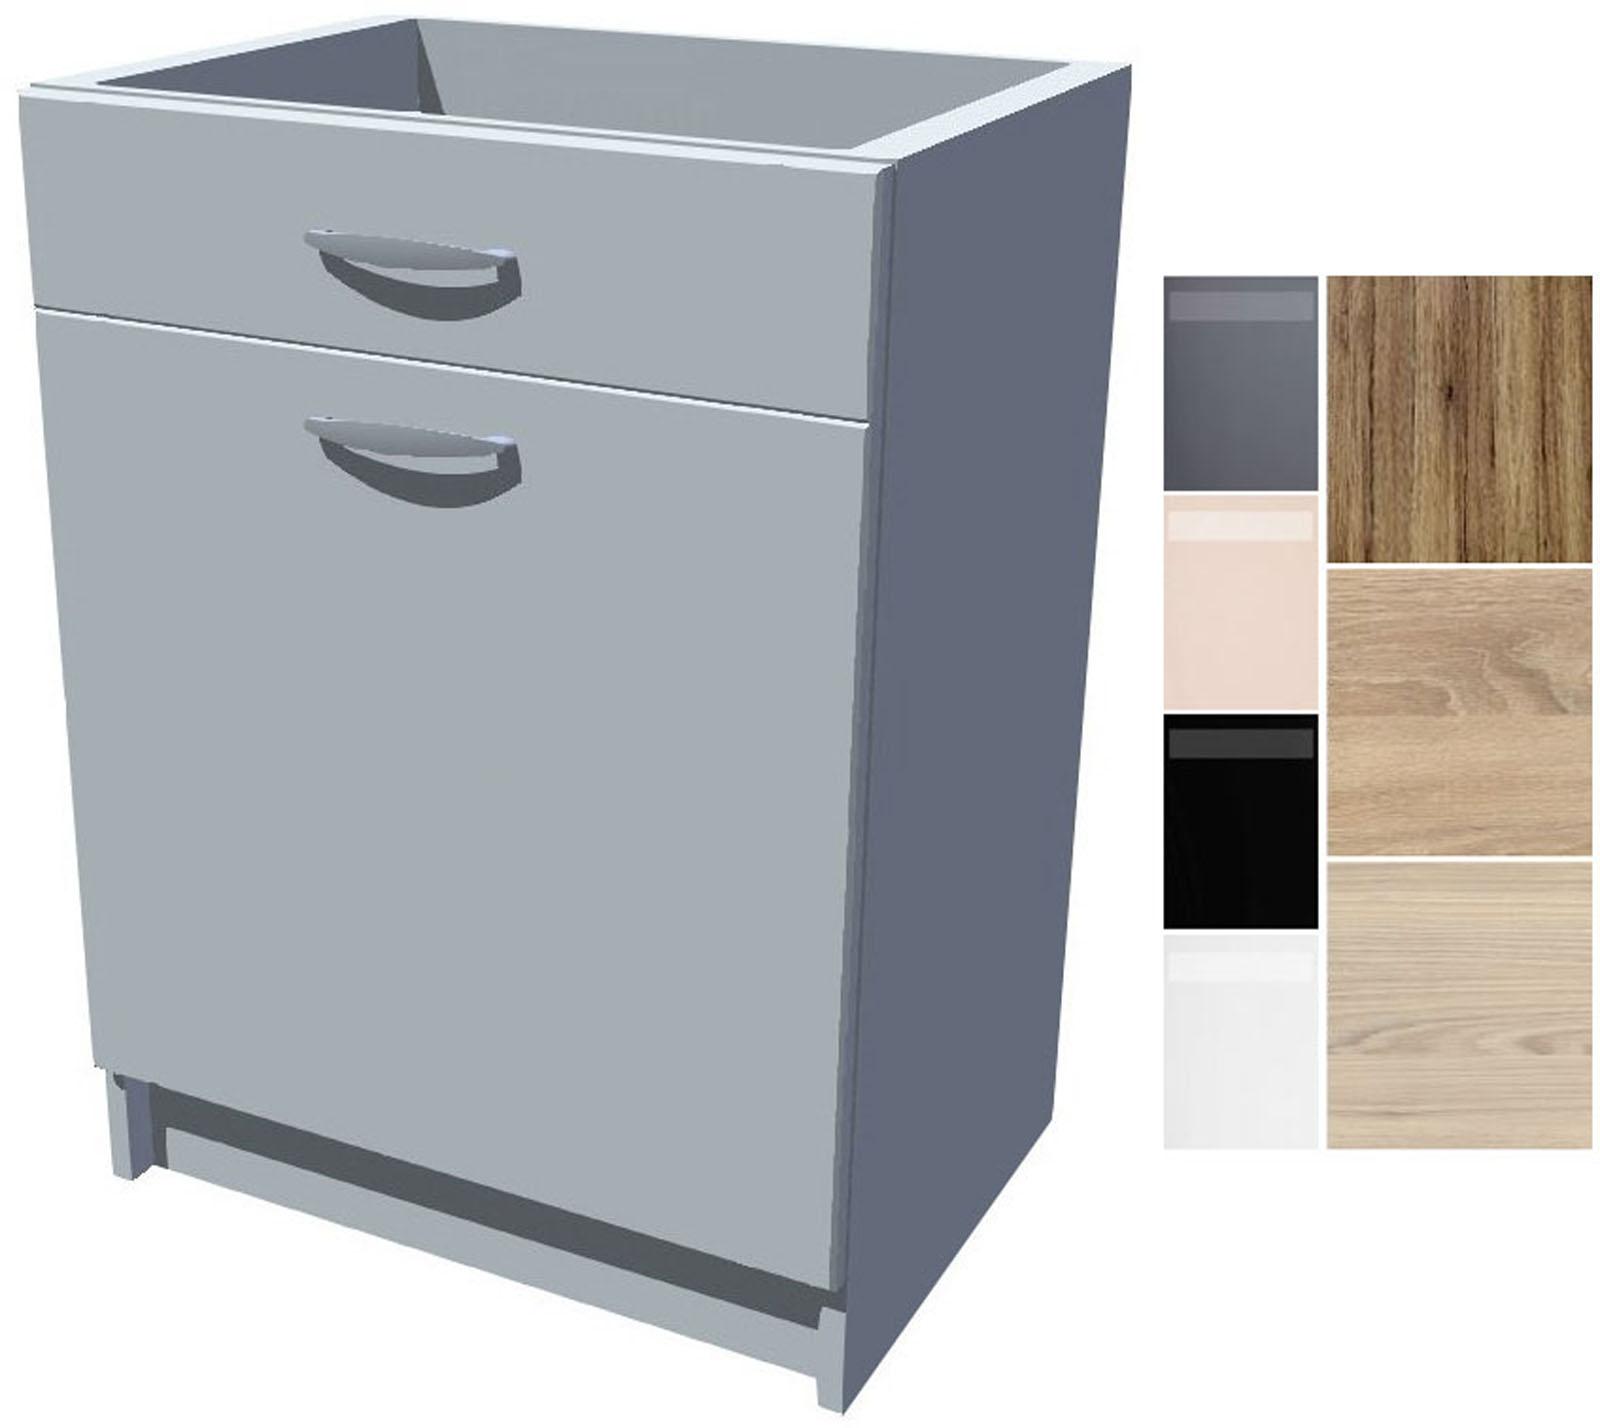 Dřezová kuchyňská skříňka Iga 1D 50 cm